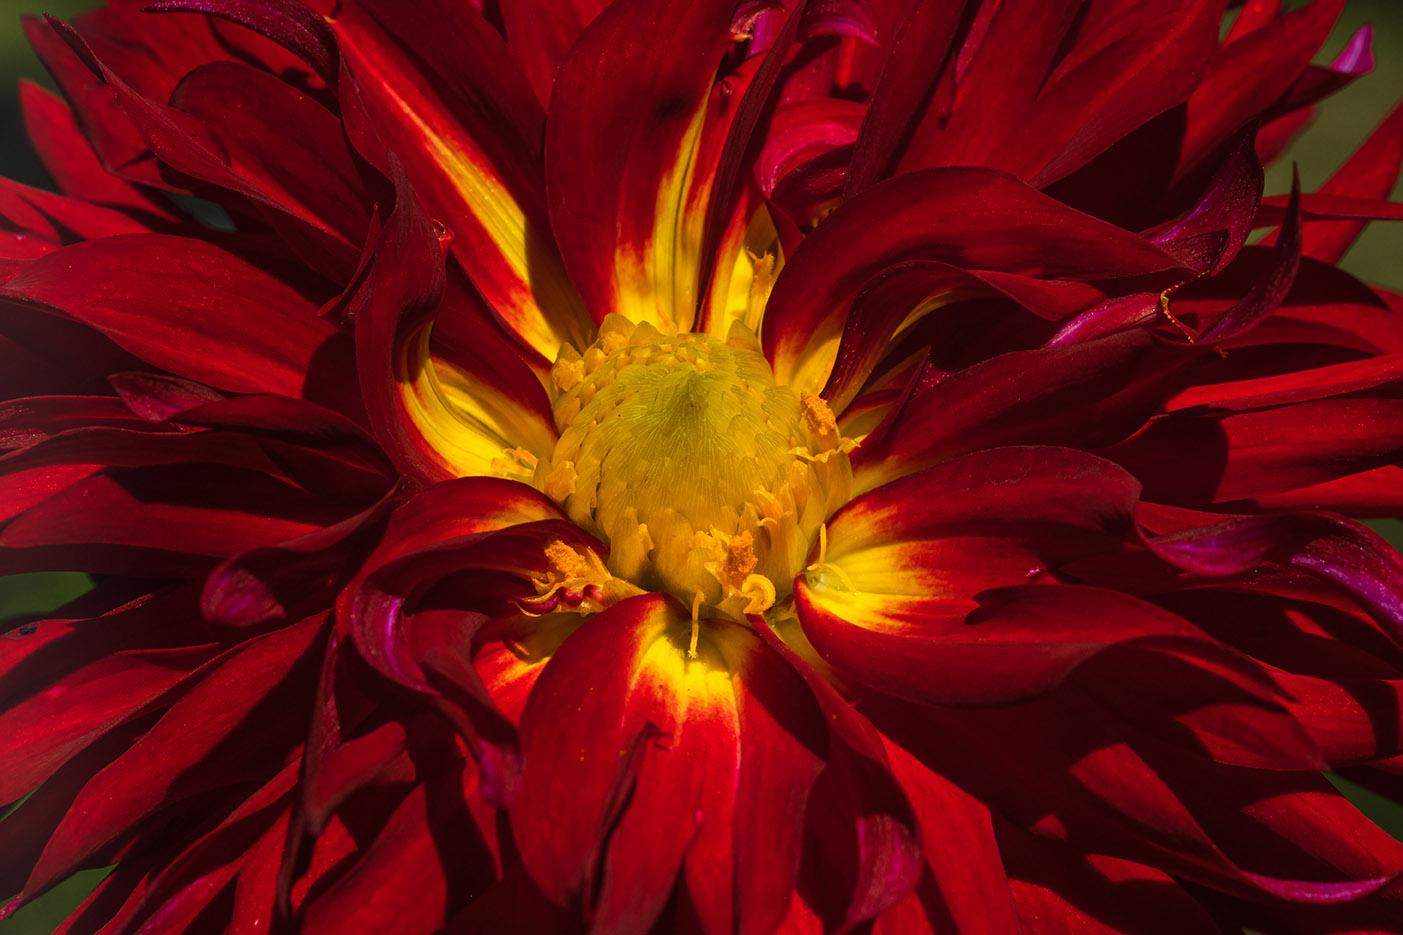 Crimson and yellow dahlia 9-19-21 - lr